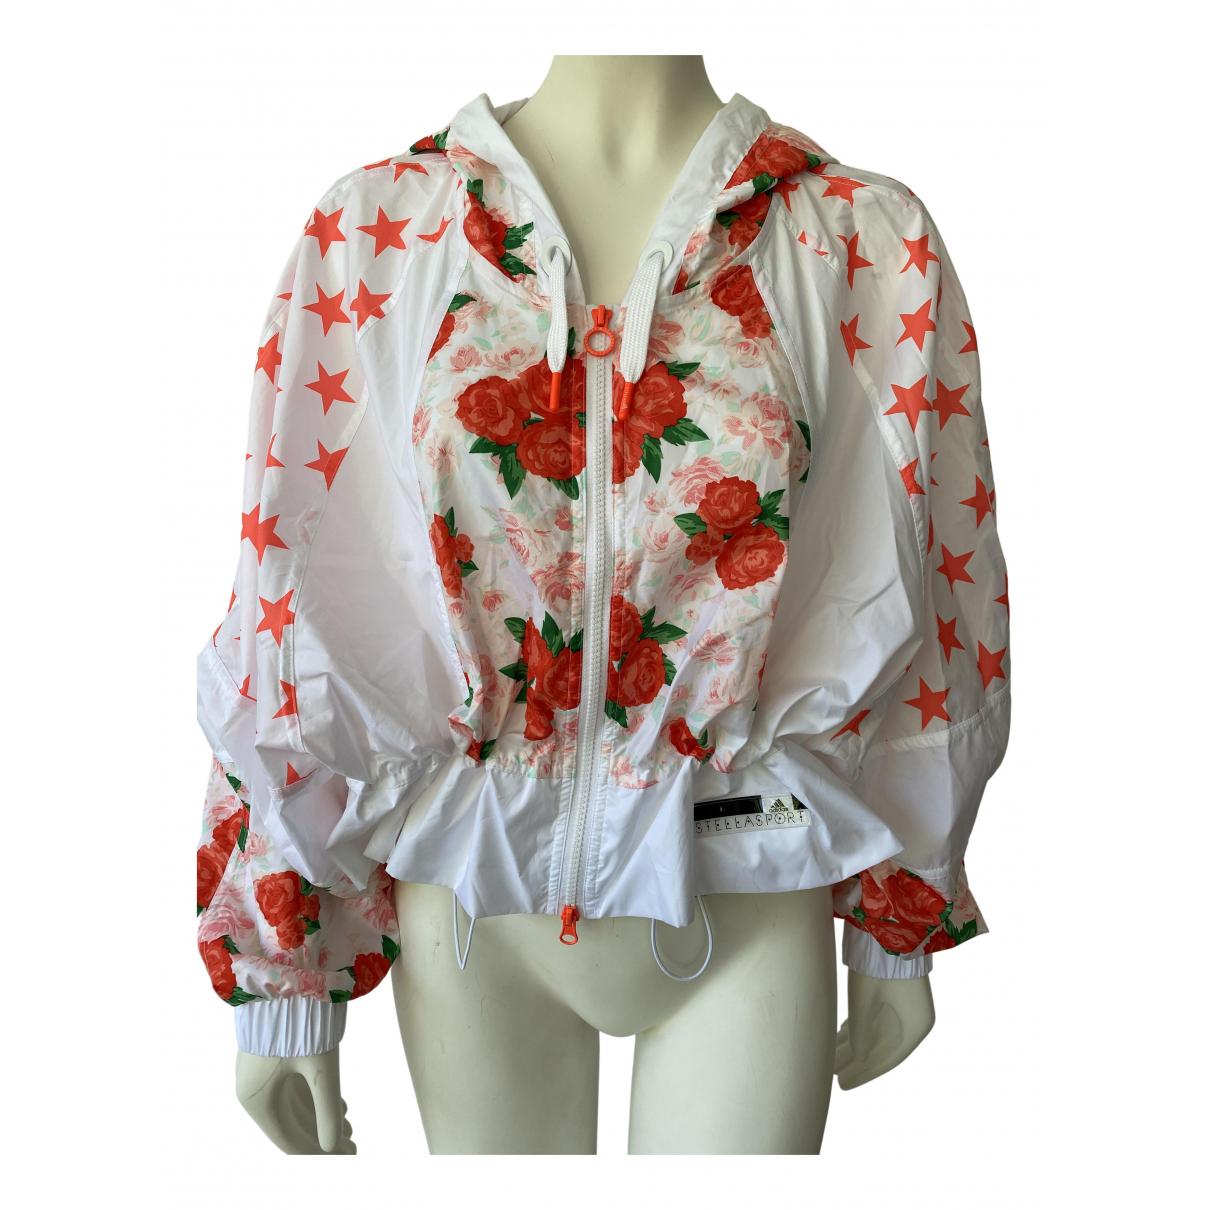 Stella Mccartney Pour Adidas \N Multicolour jacket for Women L International